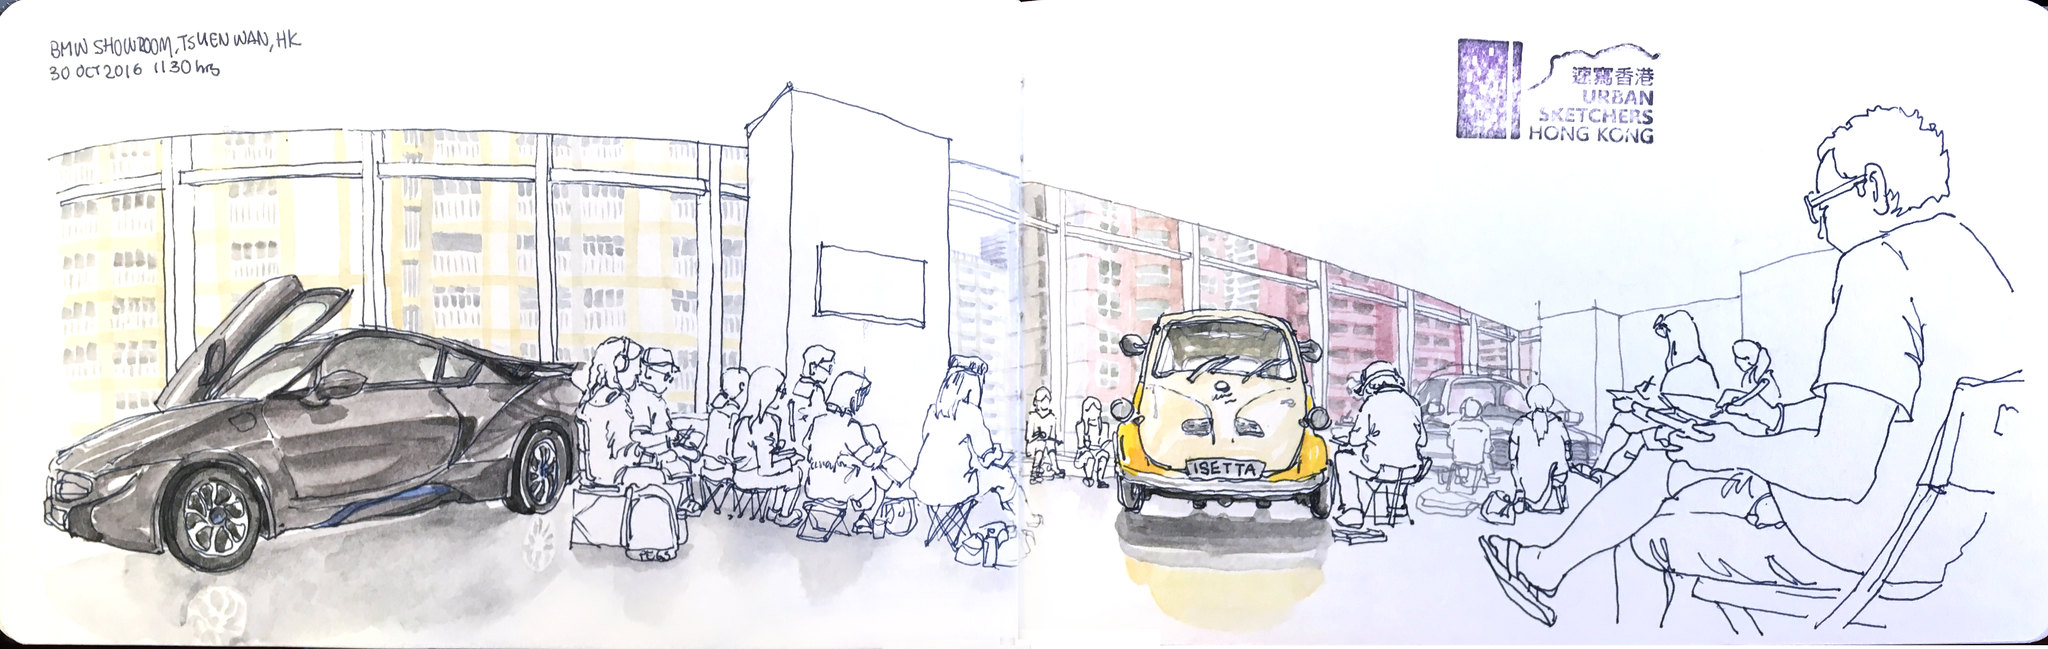 A Short HongKong Getaway | Urban Sketchers